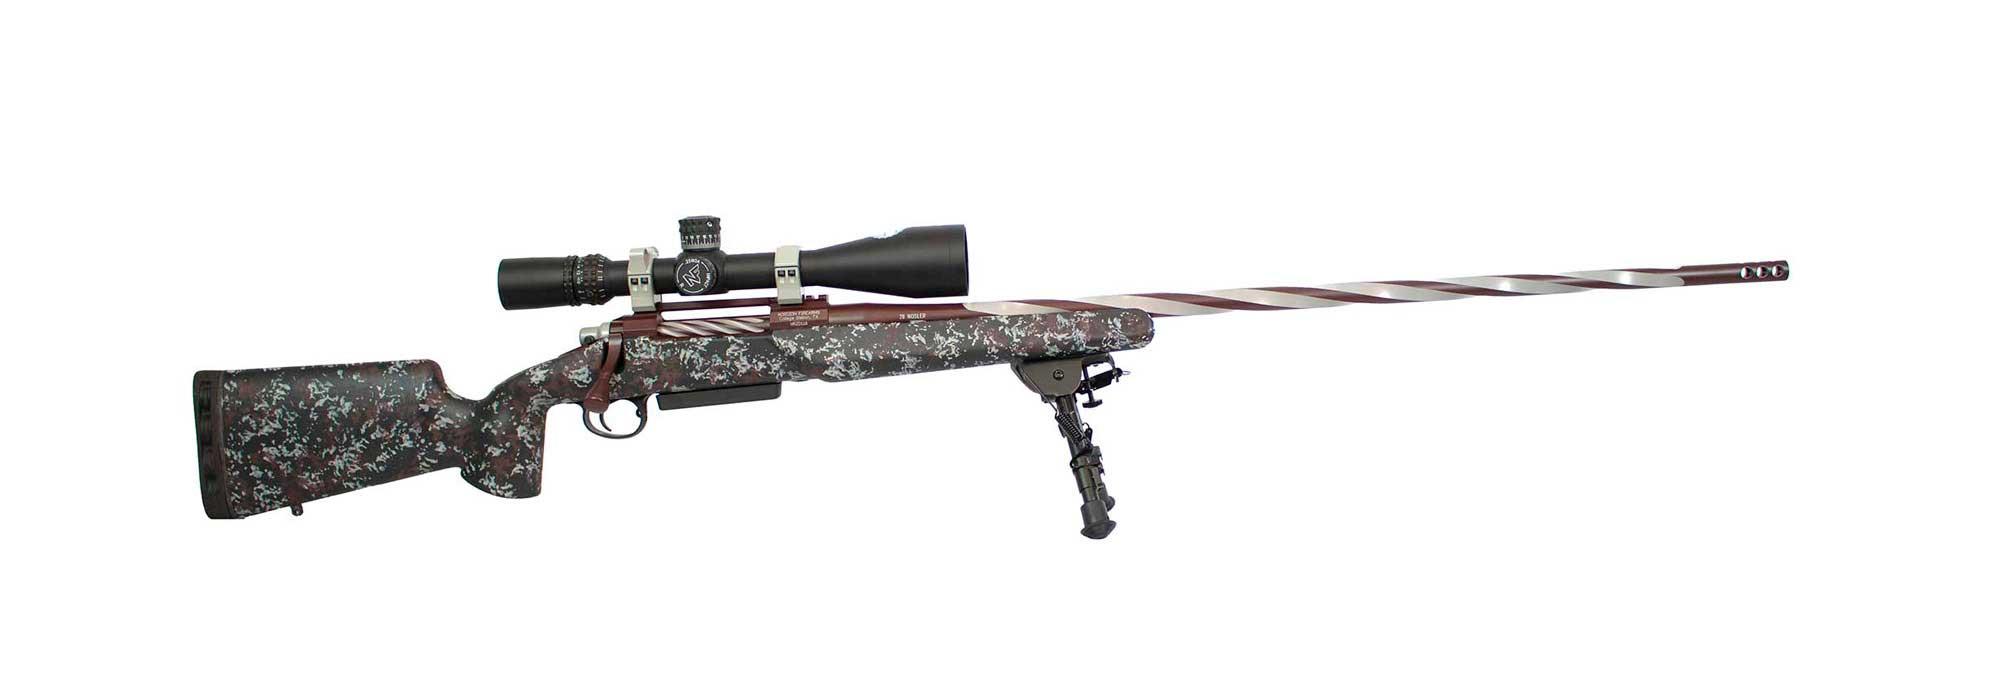 Long range shooting clipart